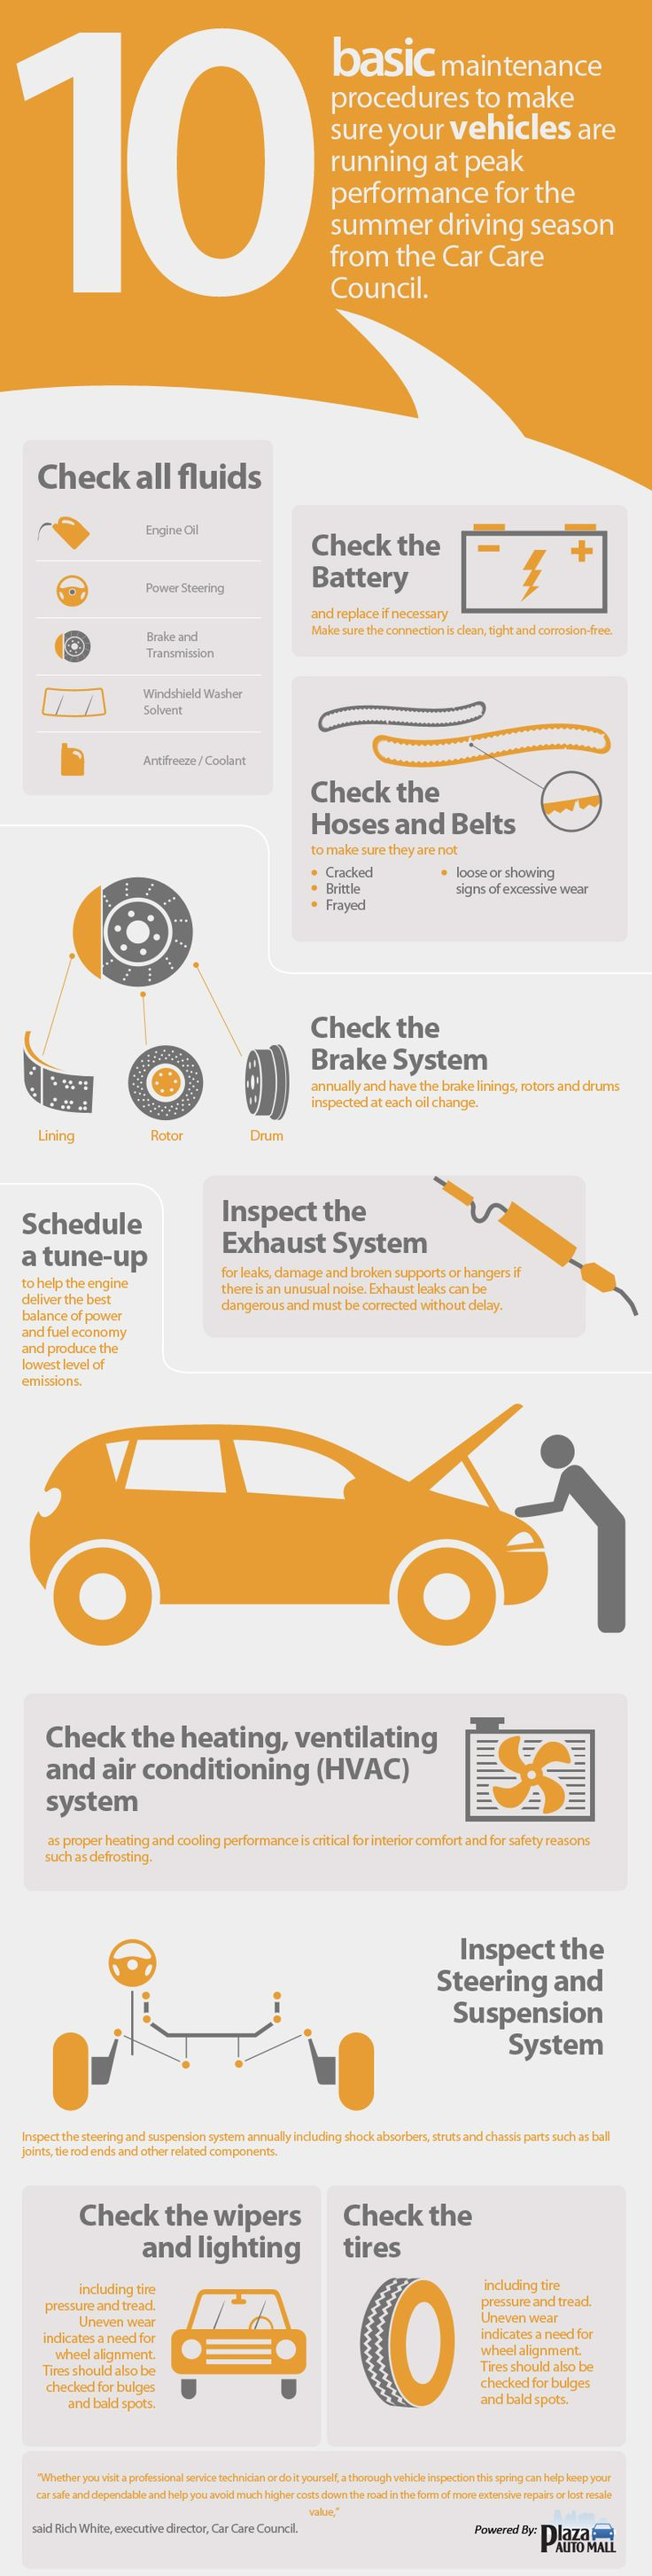 Hyundai Maintenance Schedule 1000 Ideas About New Hyundai Cars On Pinterest Tata Cars